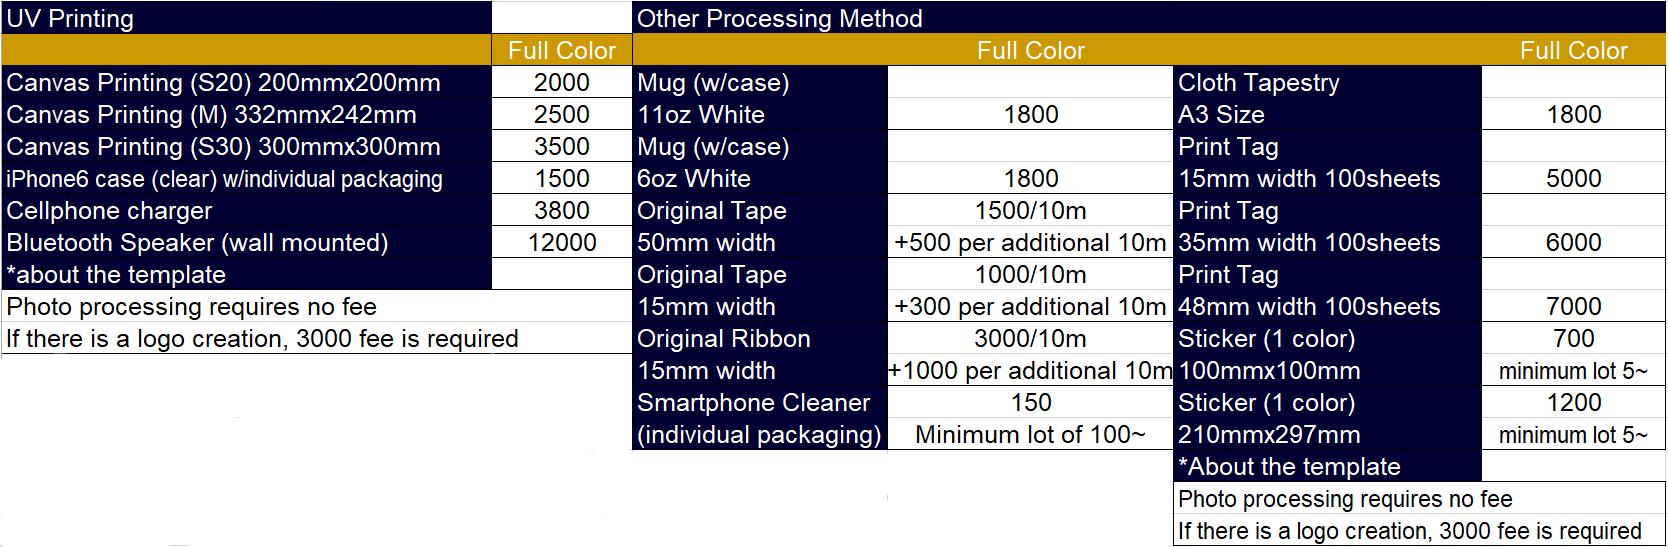 UV printing.png